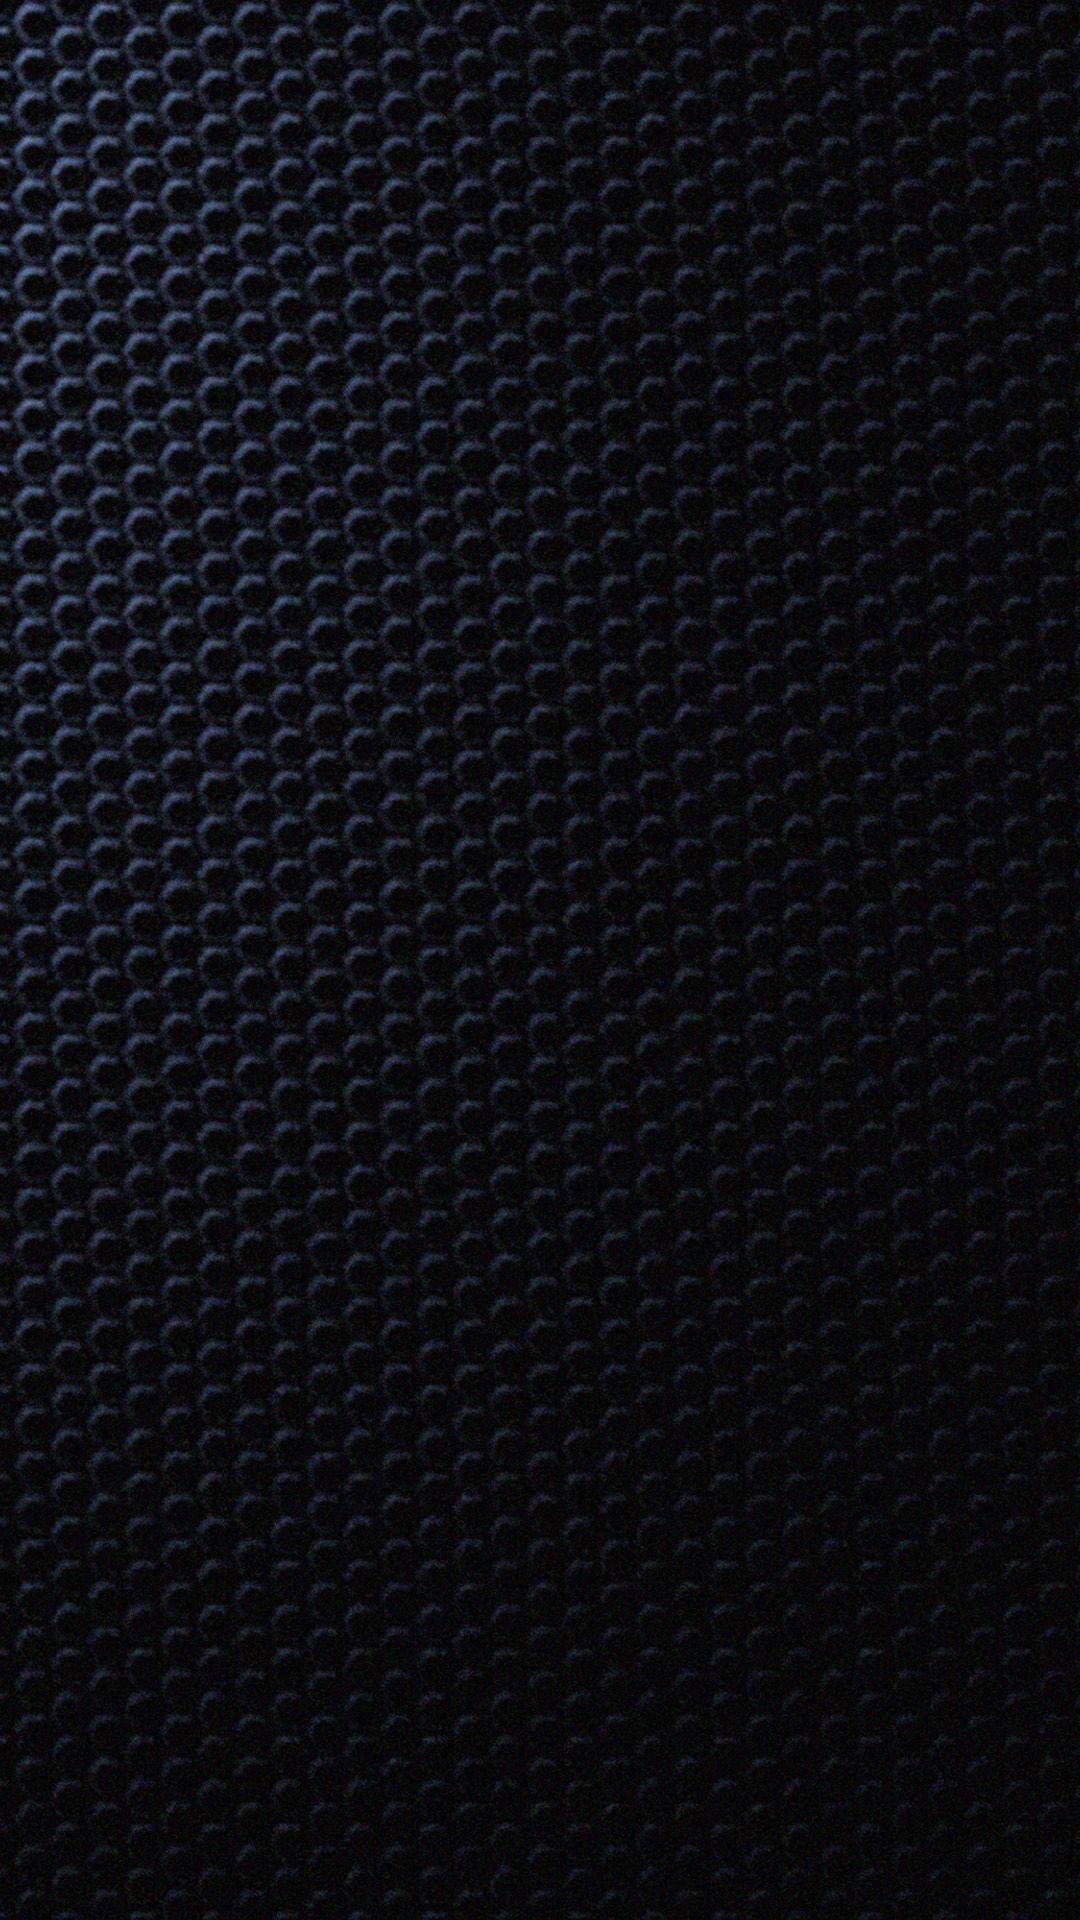 Samsung galaxy s5 wallpaper hd free download